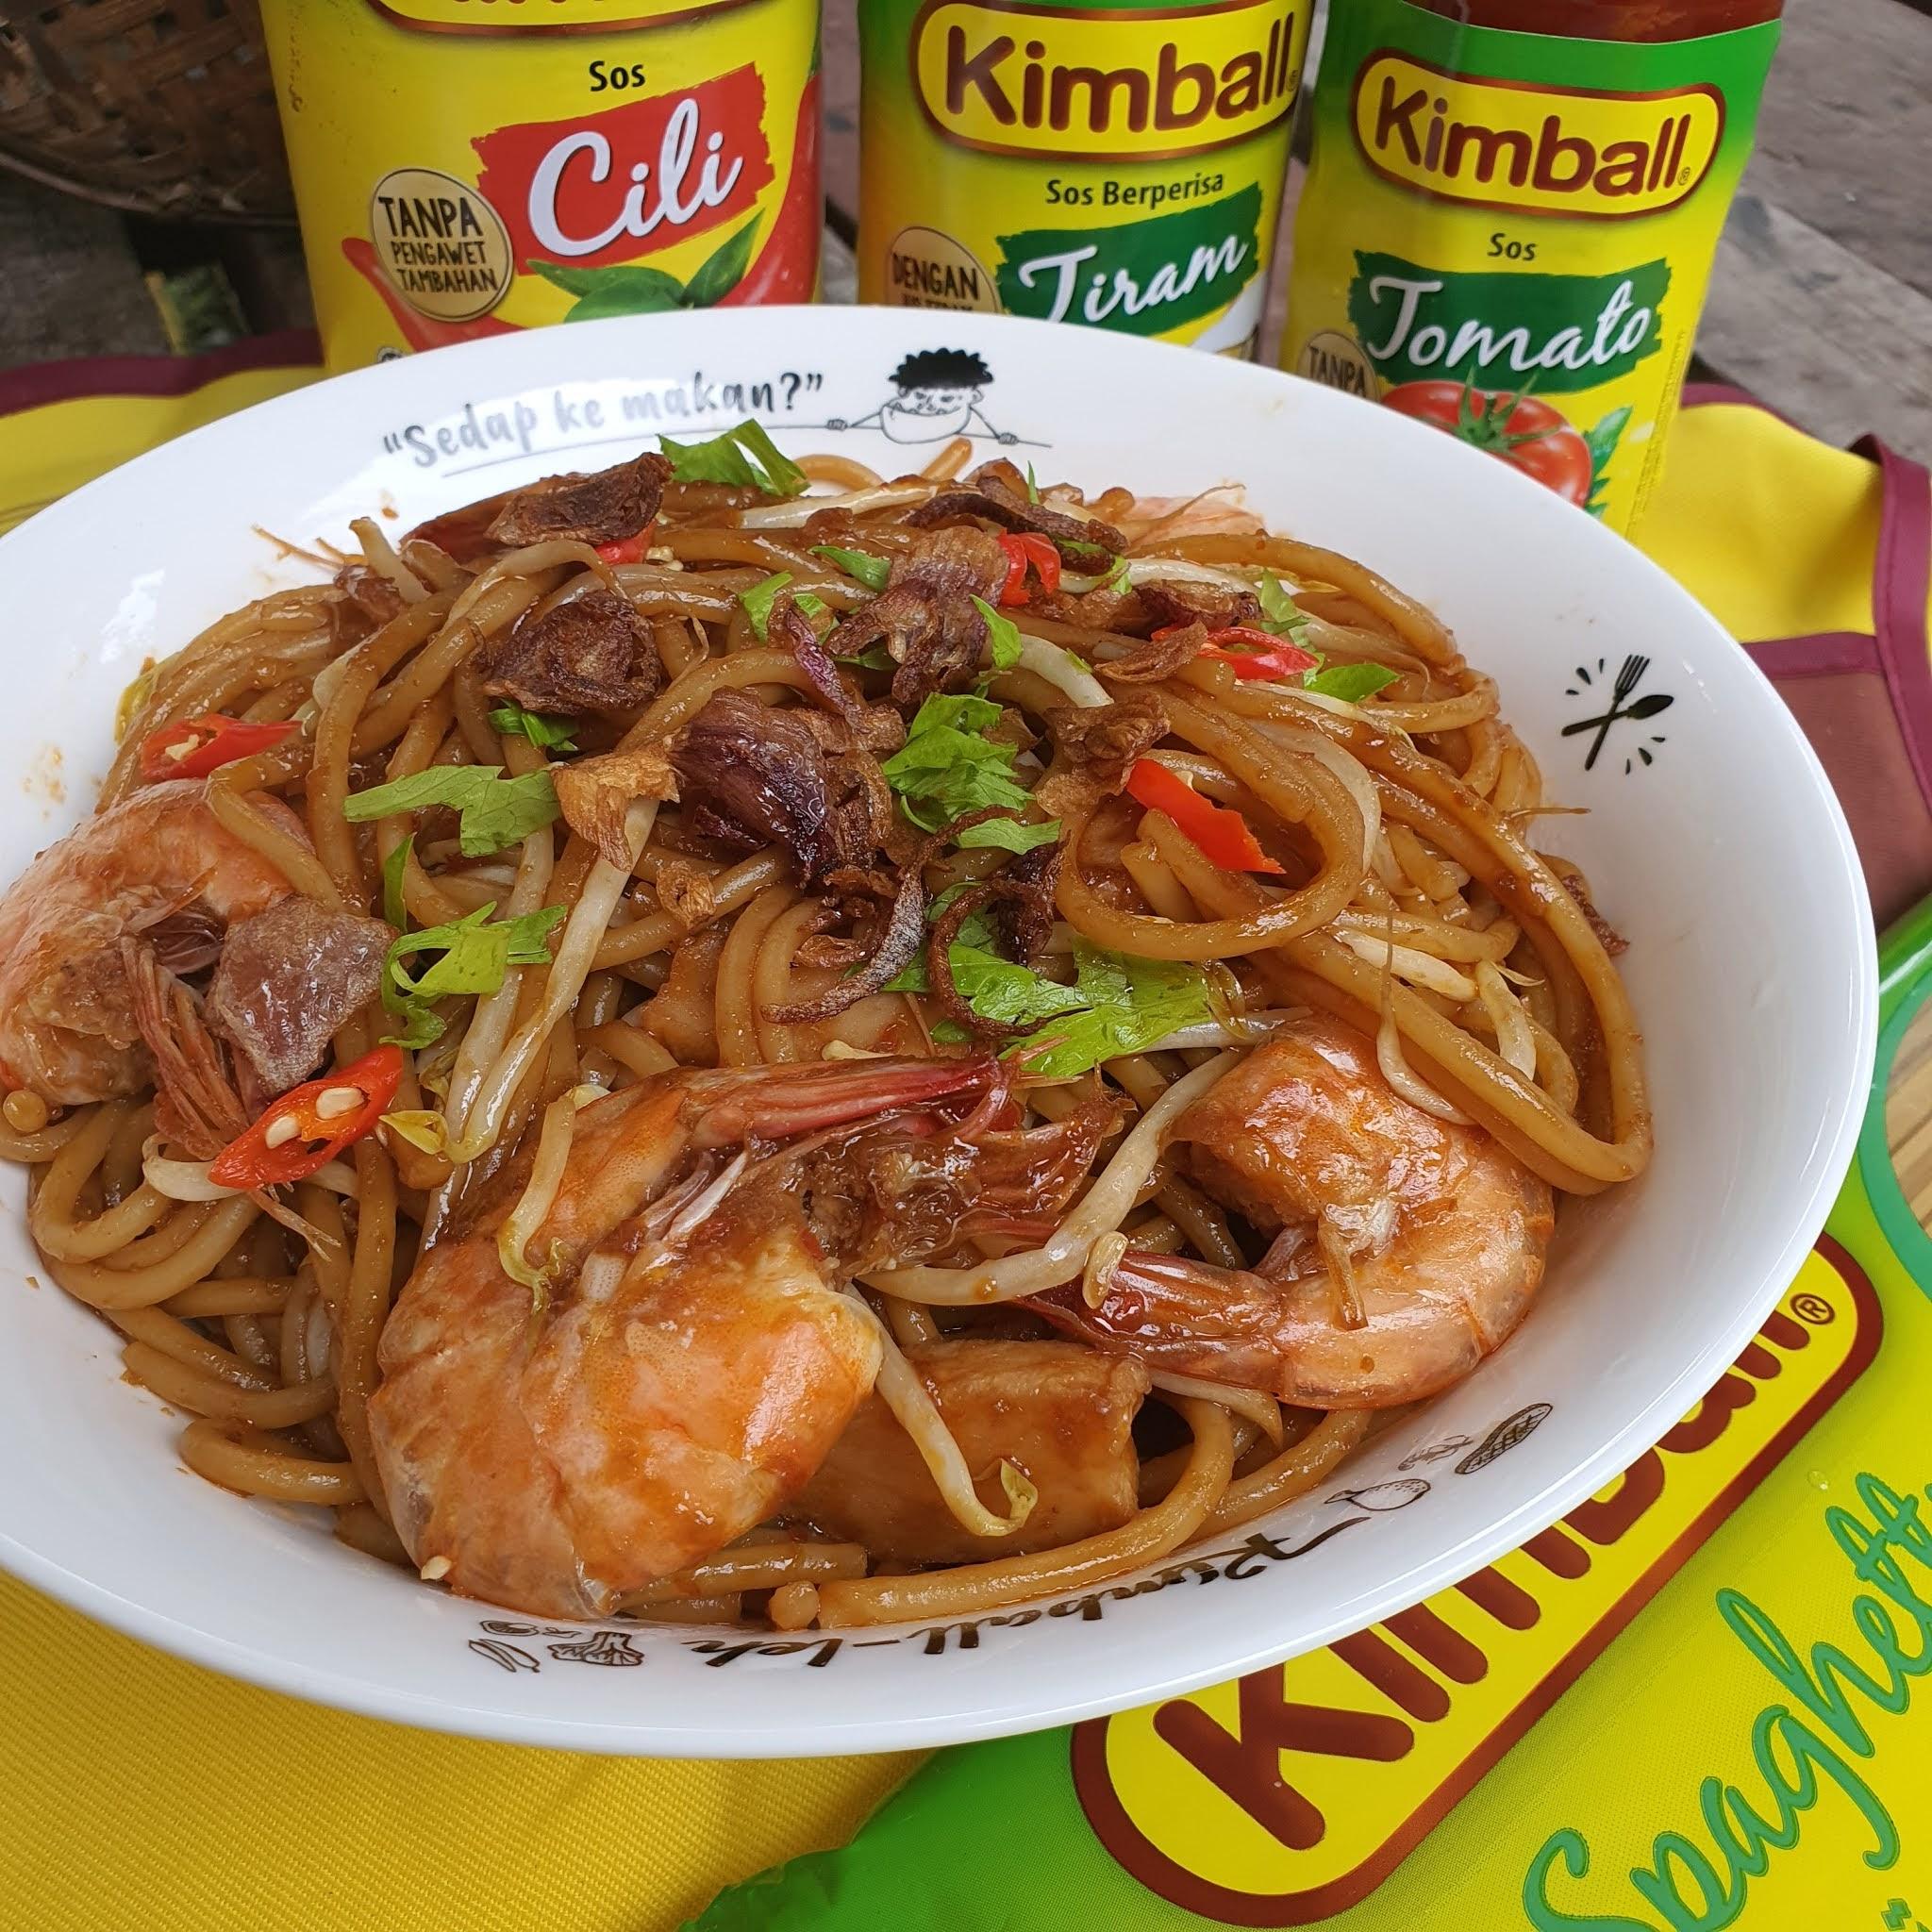 resepi spaghetti goreng daging, spaghetti goreng kampung, spaghetti goreng mamak, spaghetti goreng bolognese, spaghetti goreng, easy spaghetti goreng,